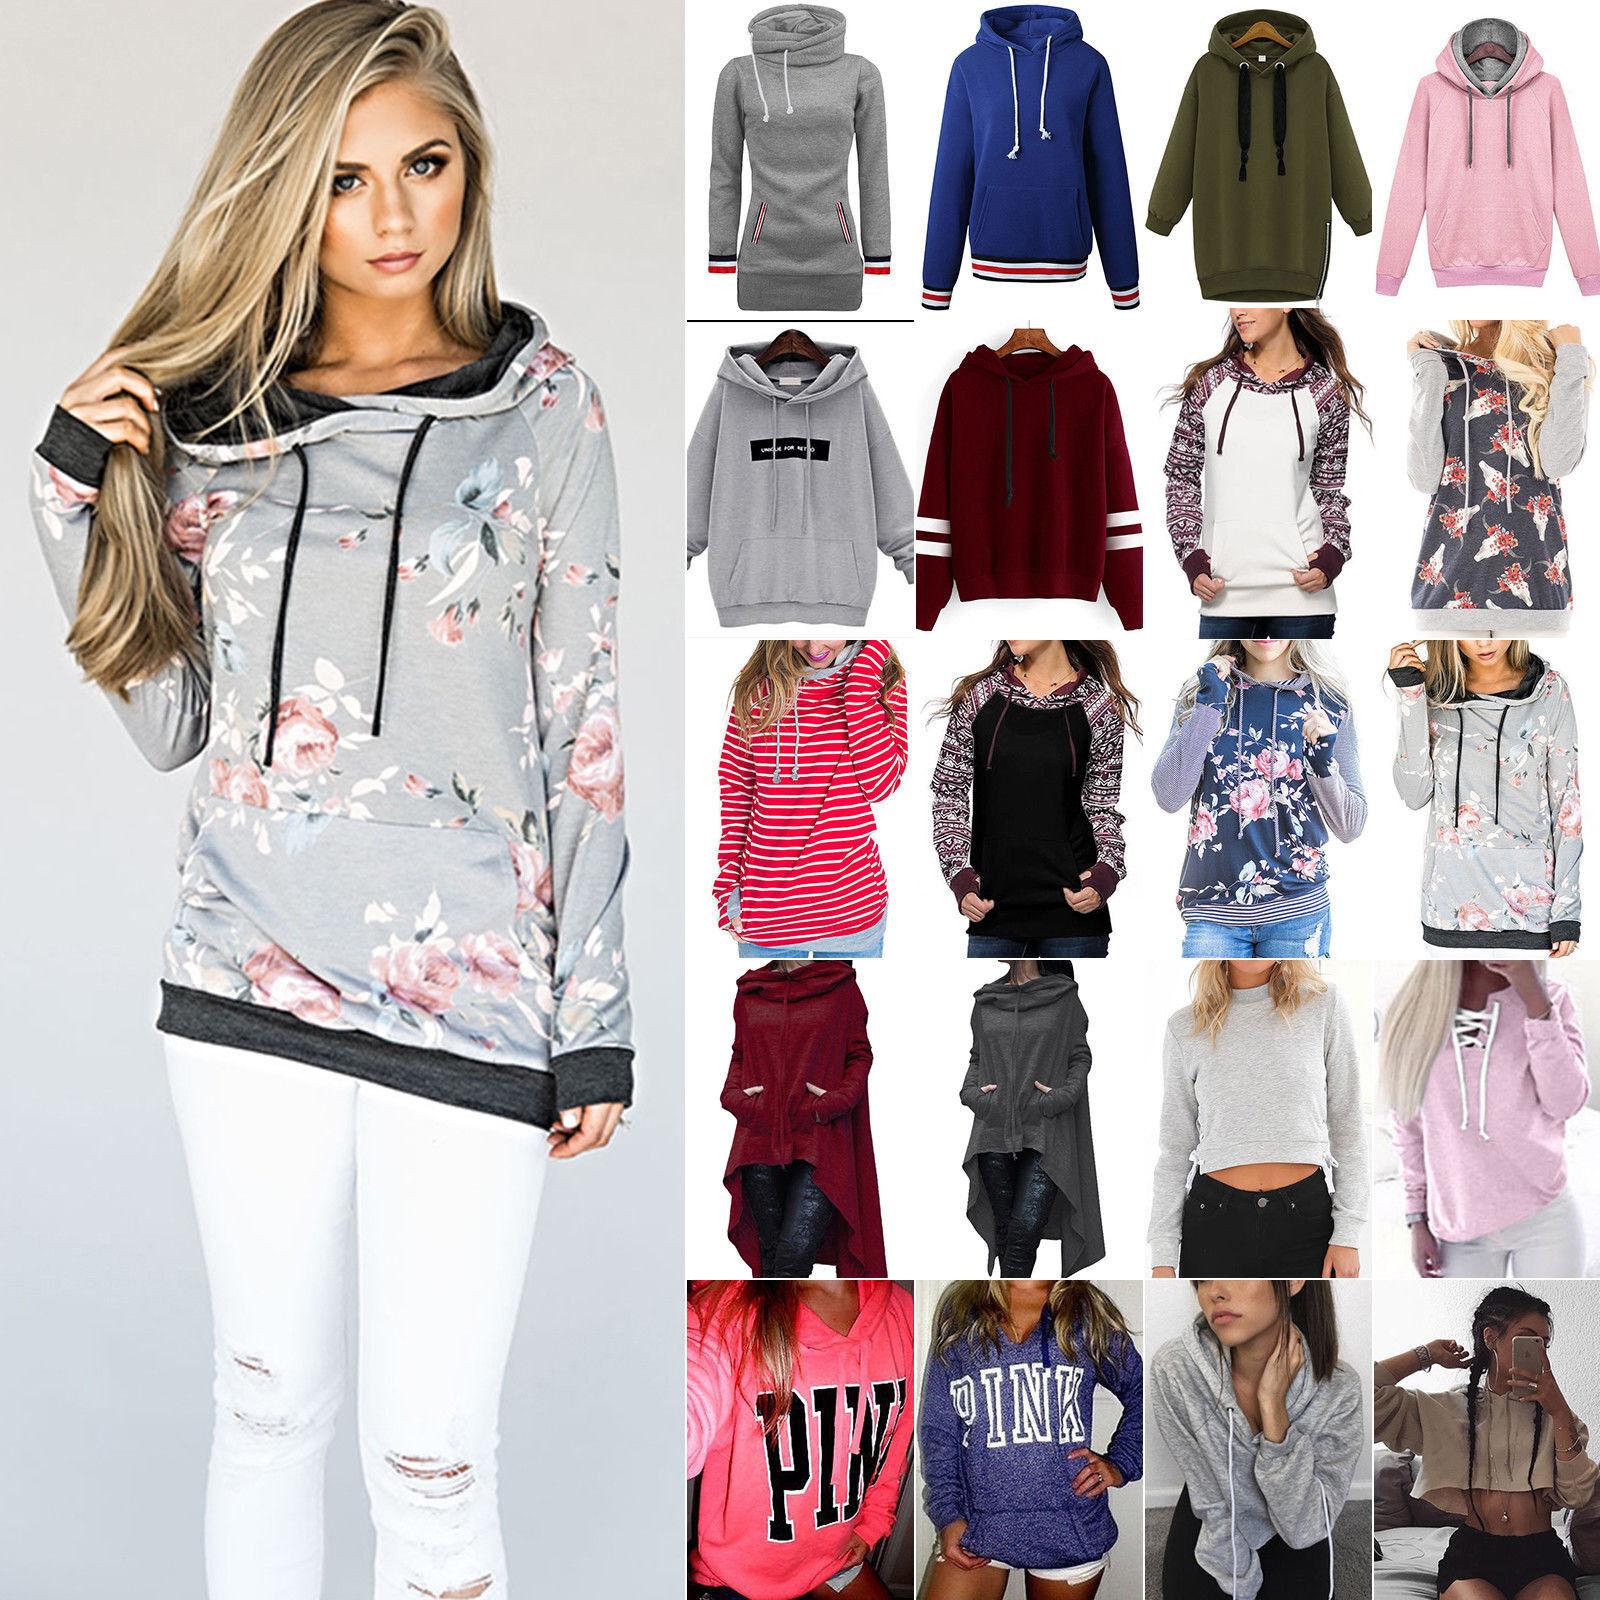 Damen Kapuzen Pullover Mantel Pullover Langarmjacke Hoodies Sweatshirt Oberteil